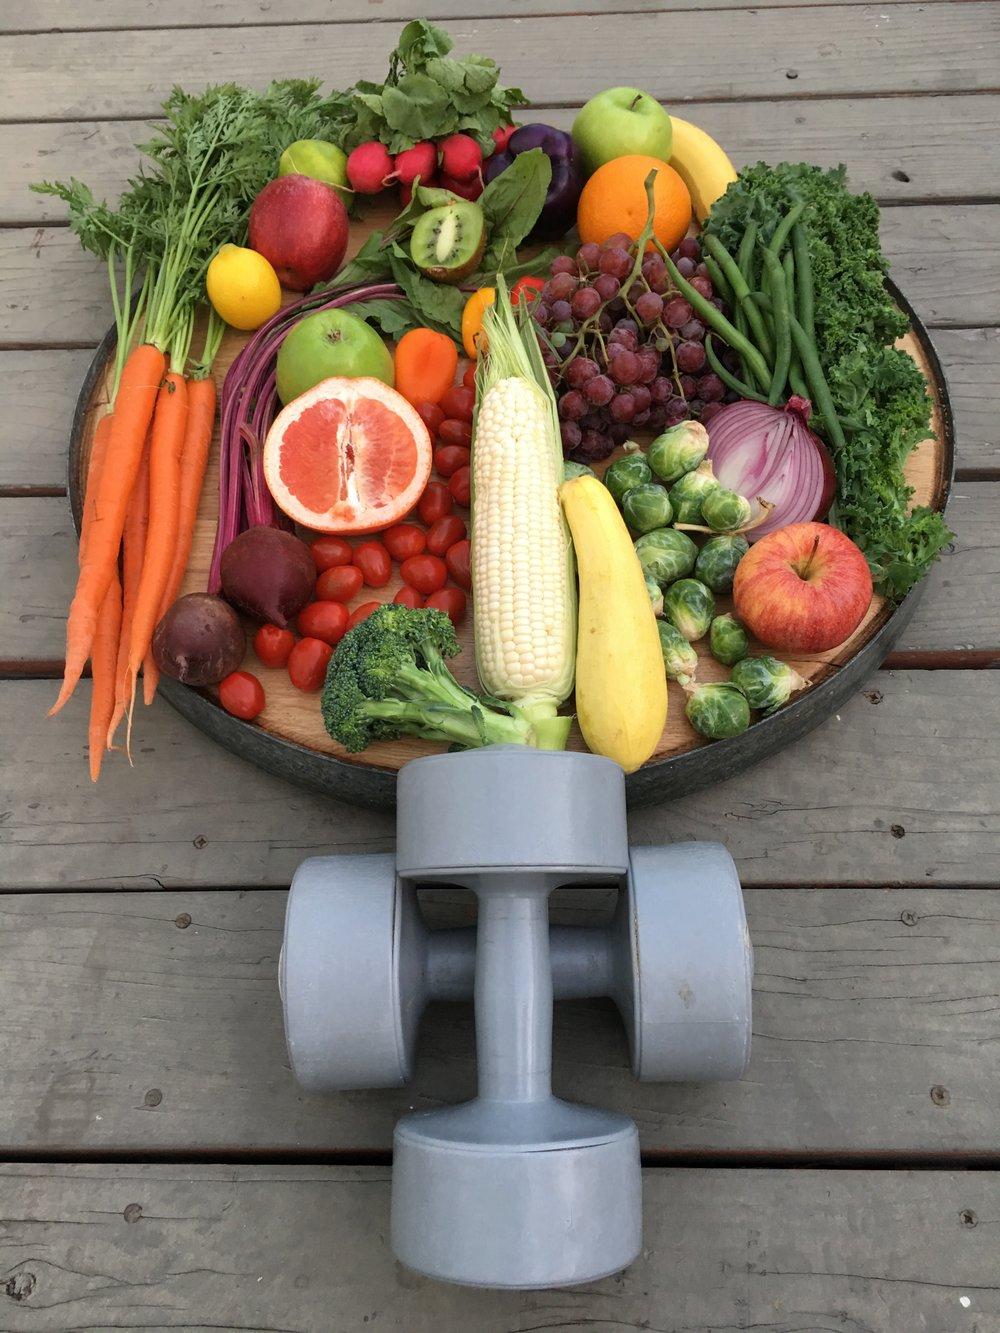 wt and fruit.jpg